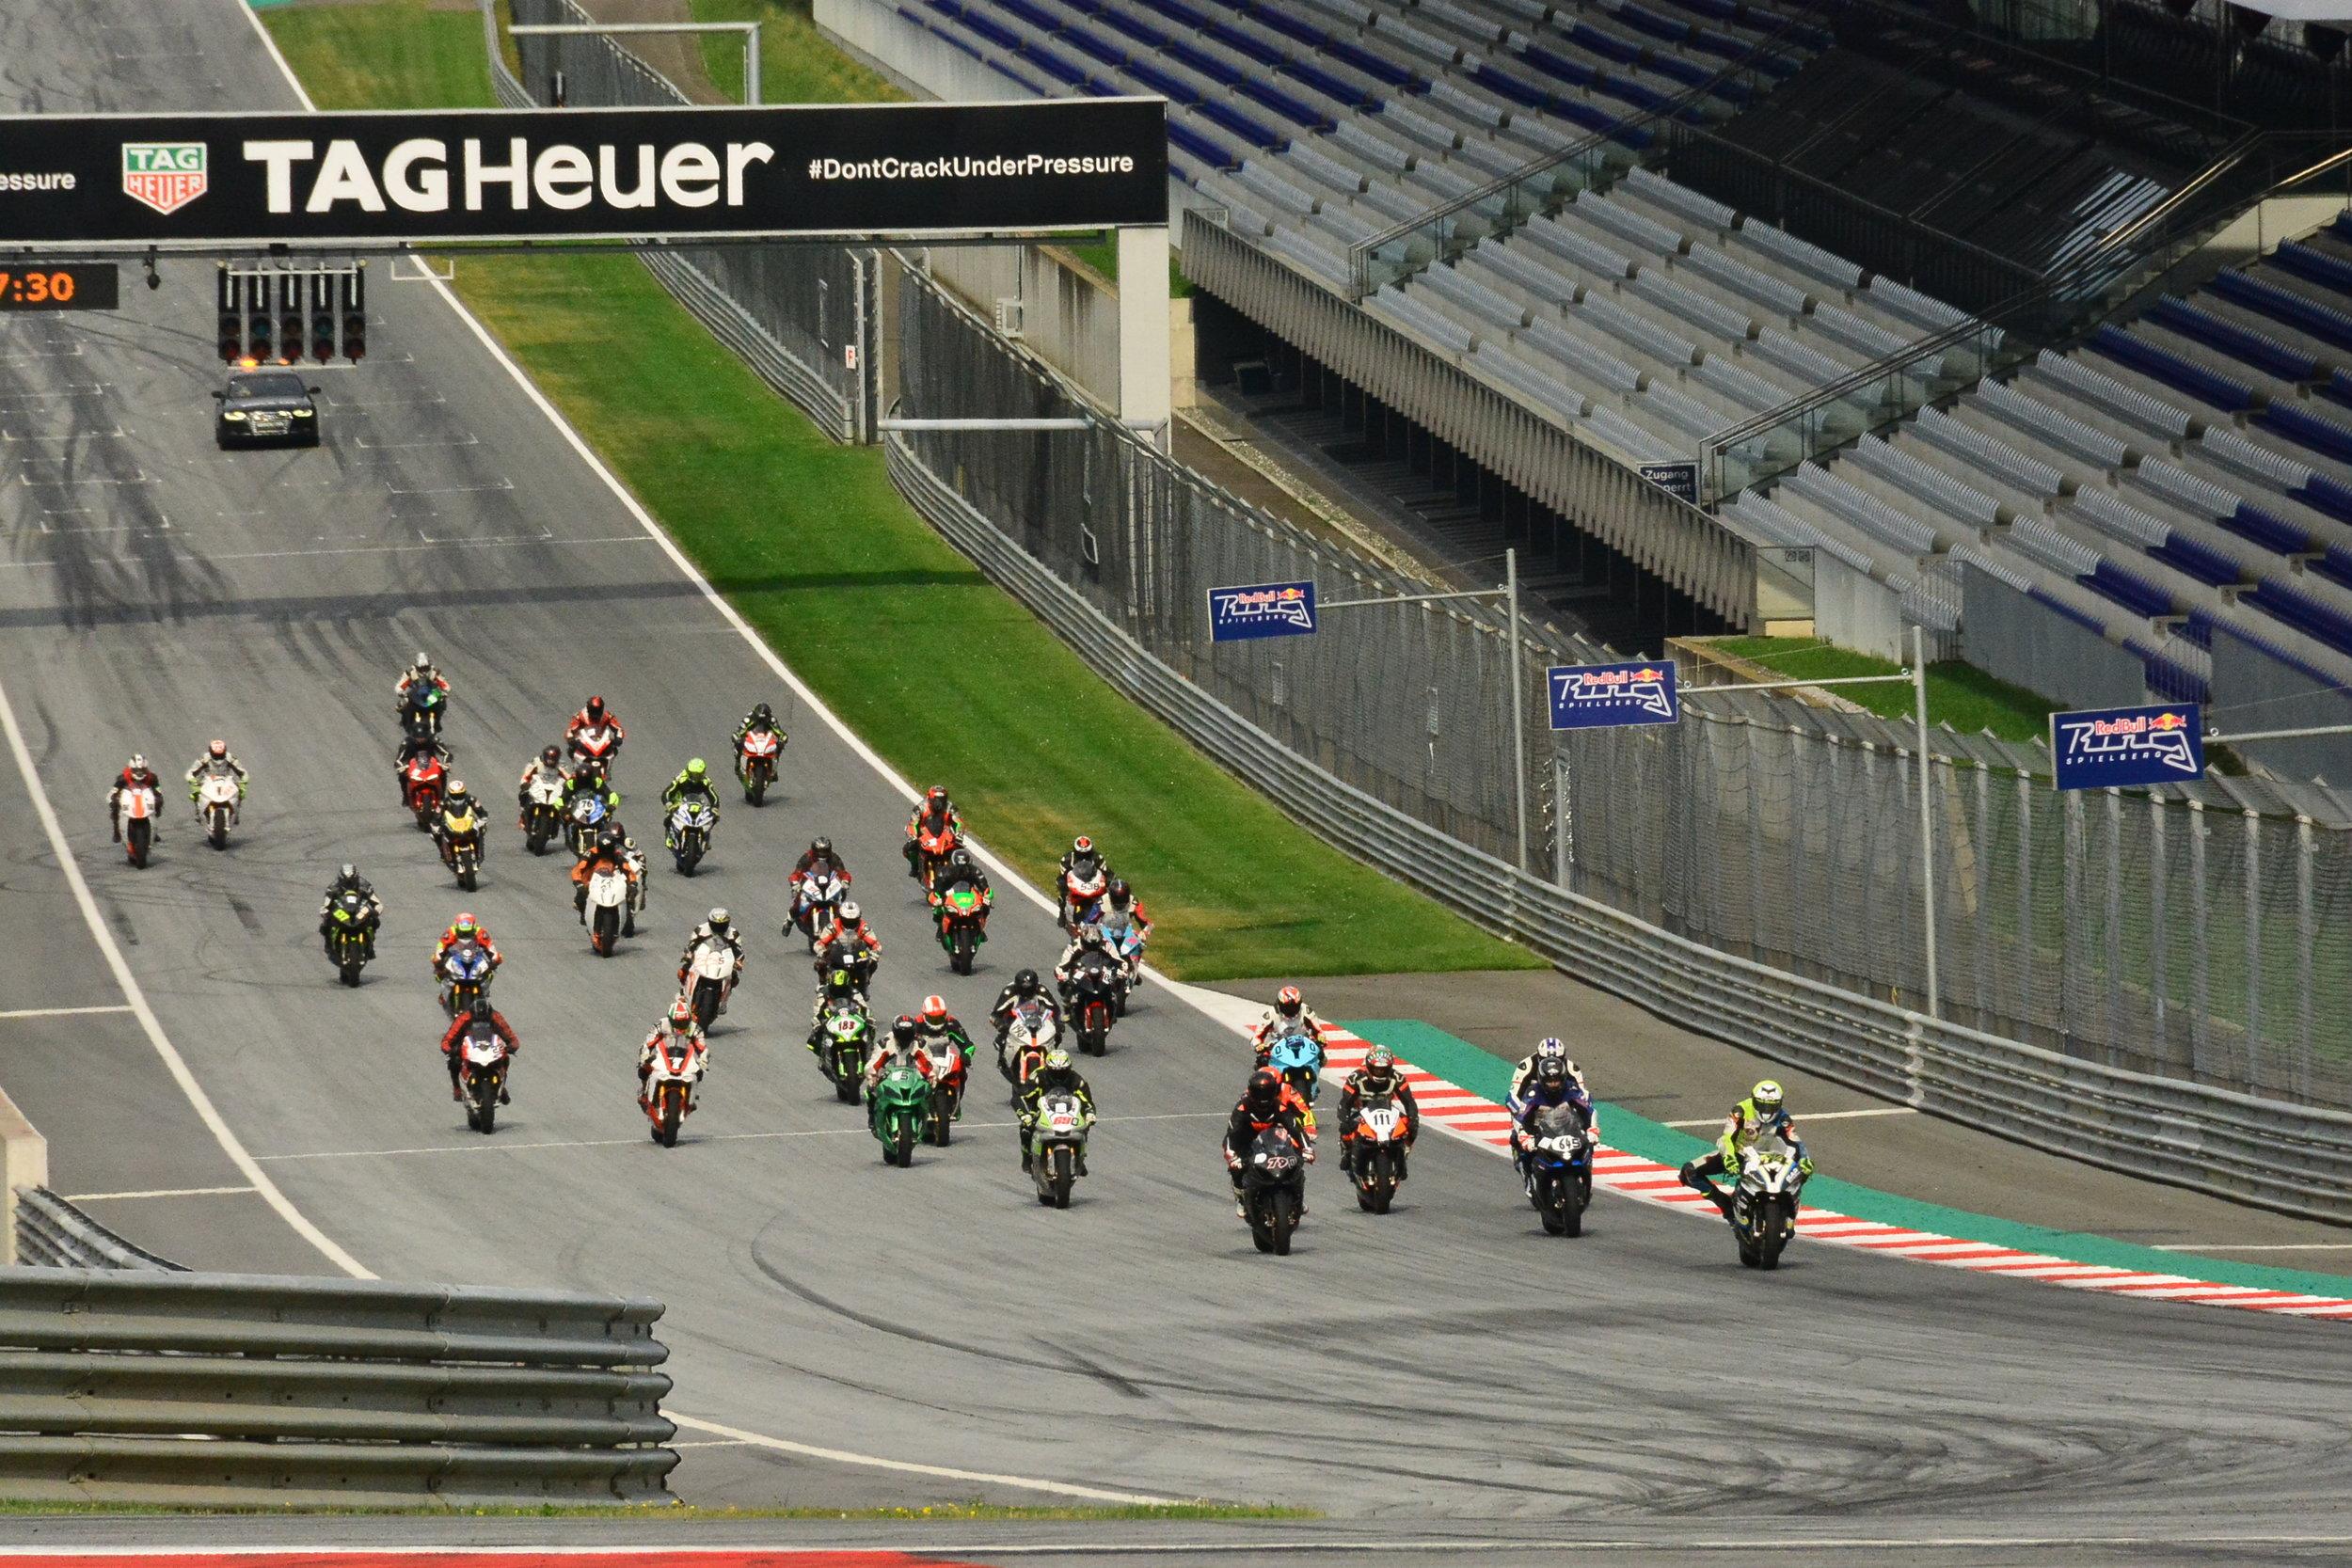 Race_1 (5).JPG